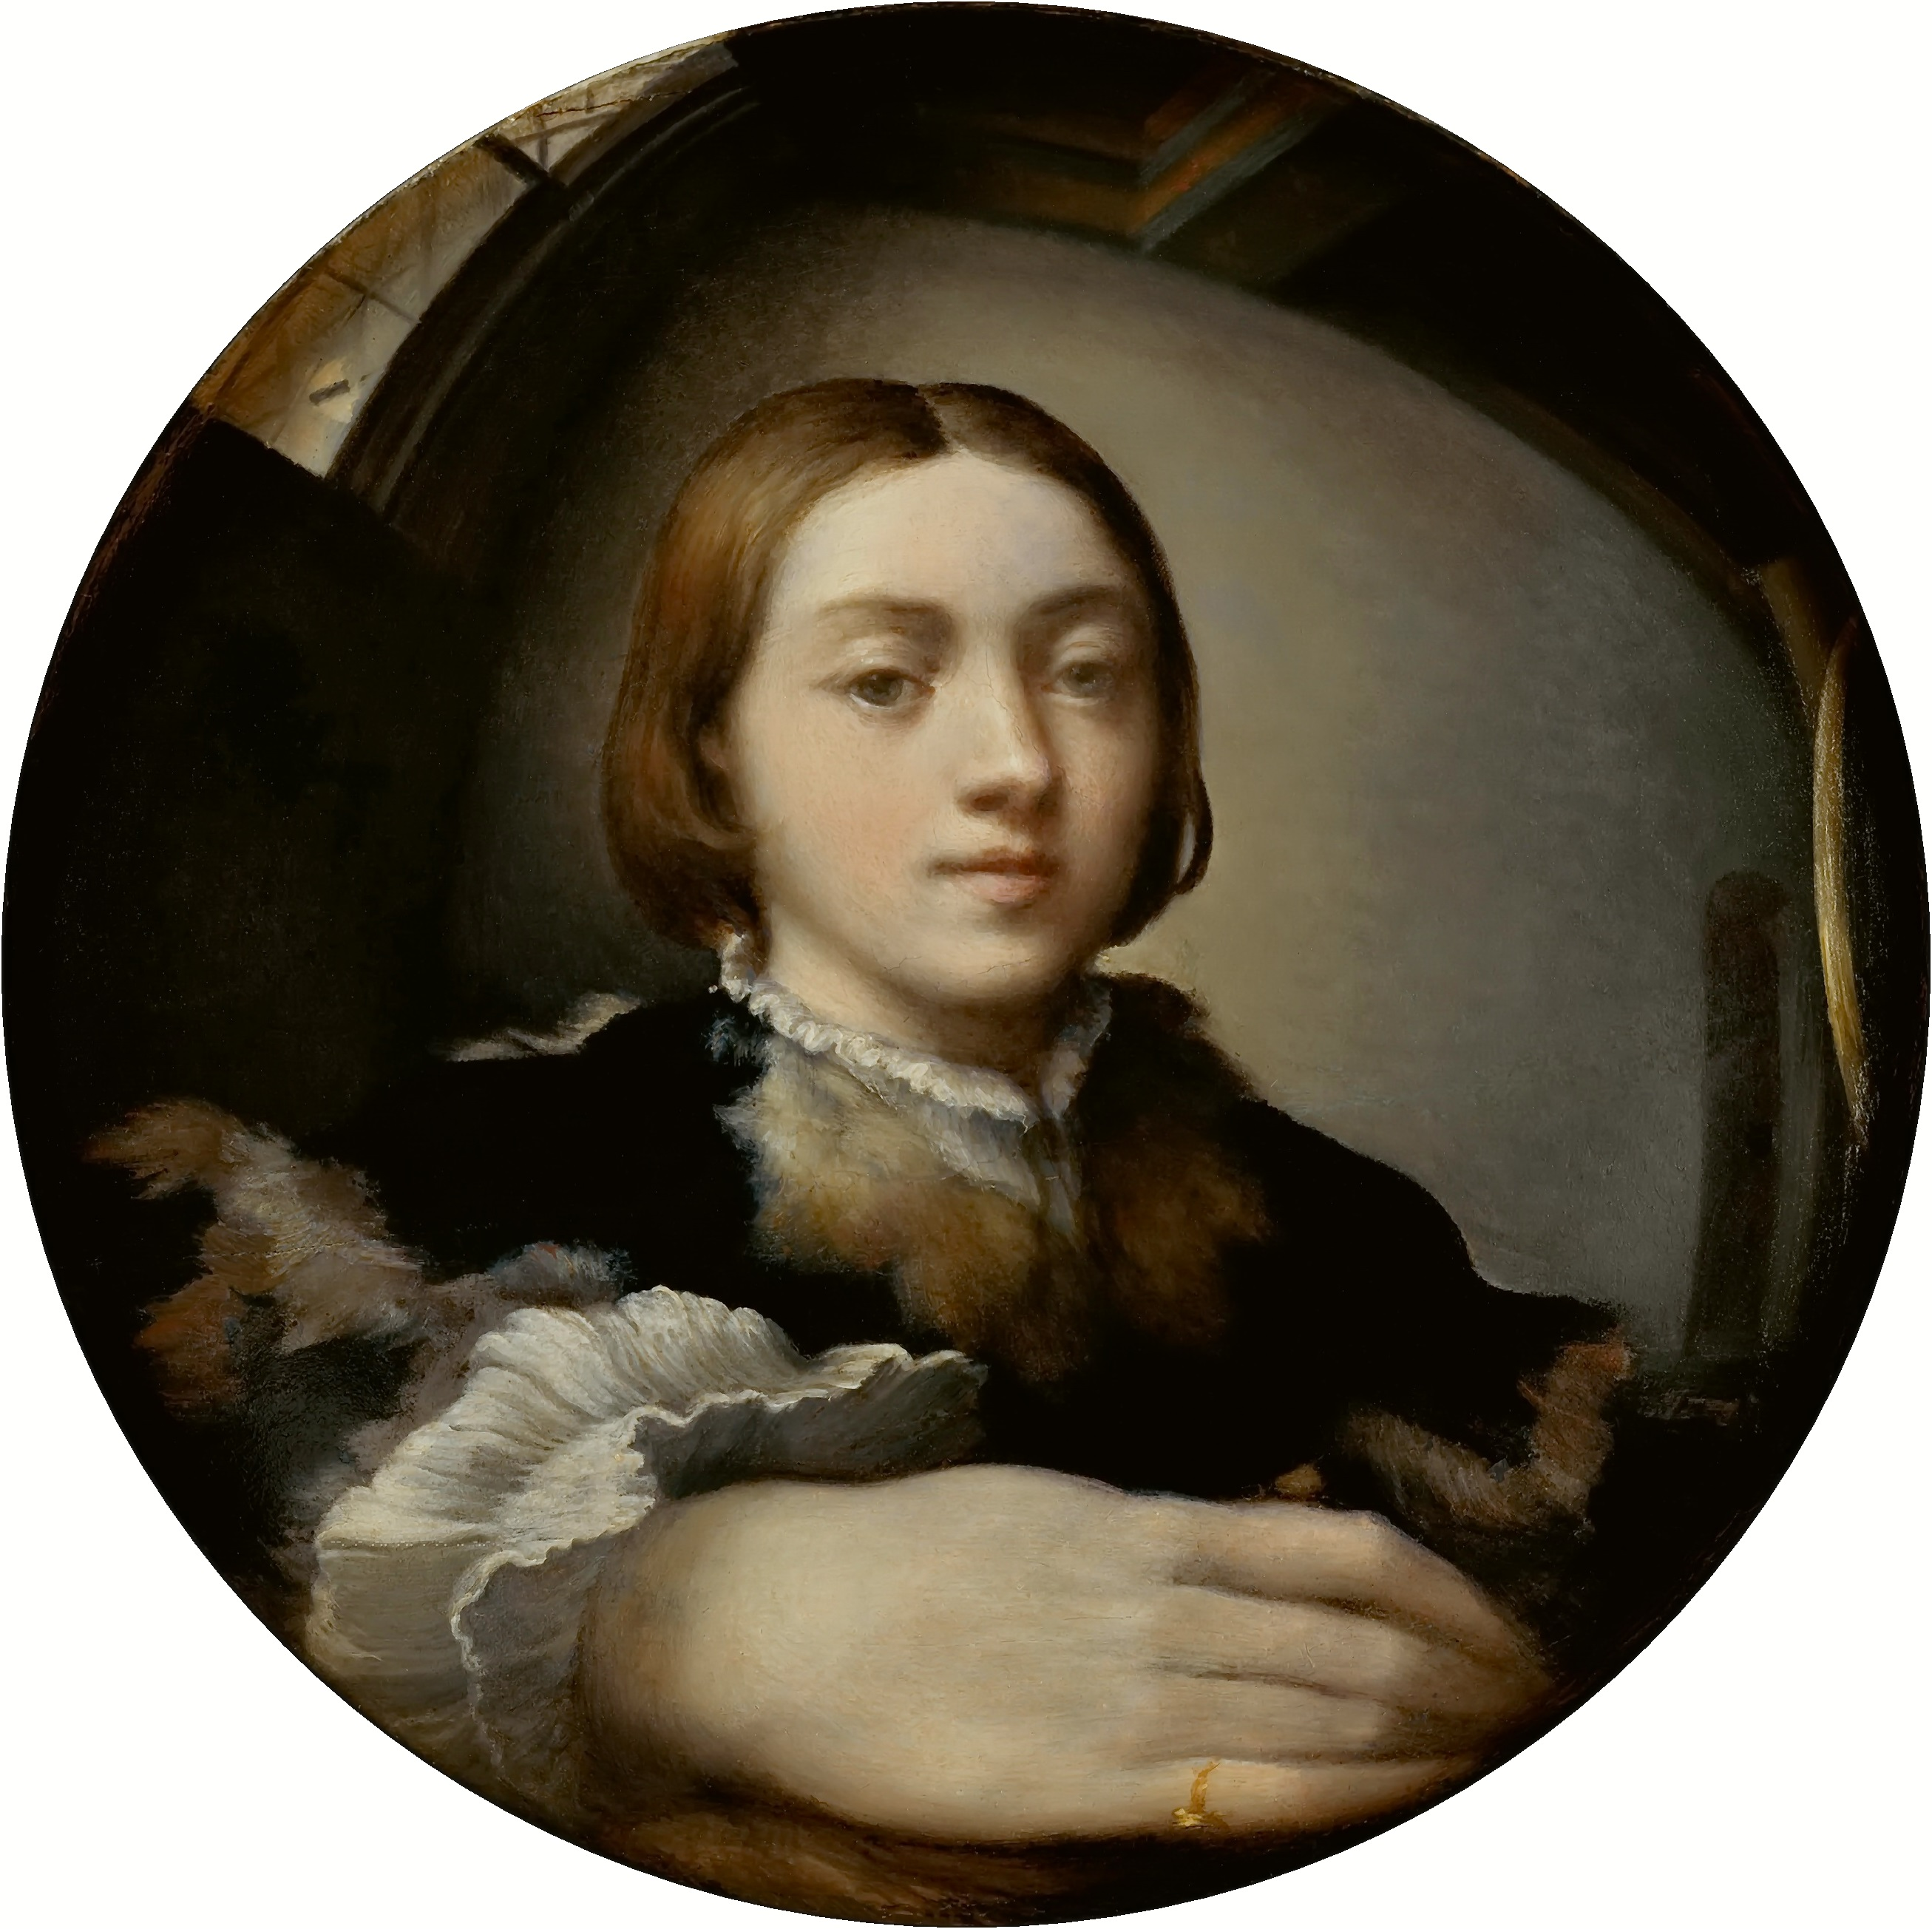 Datoteka:Parmigianino Selfportrait.jpg